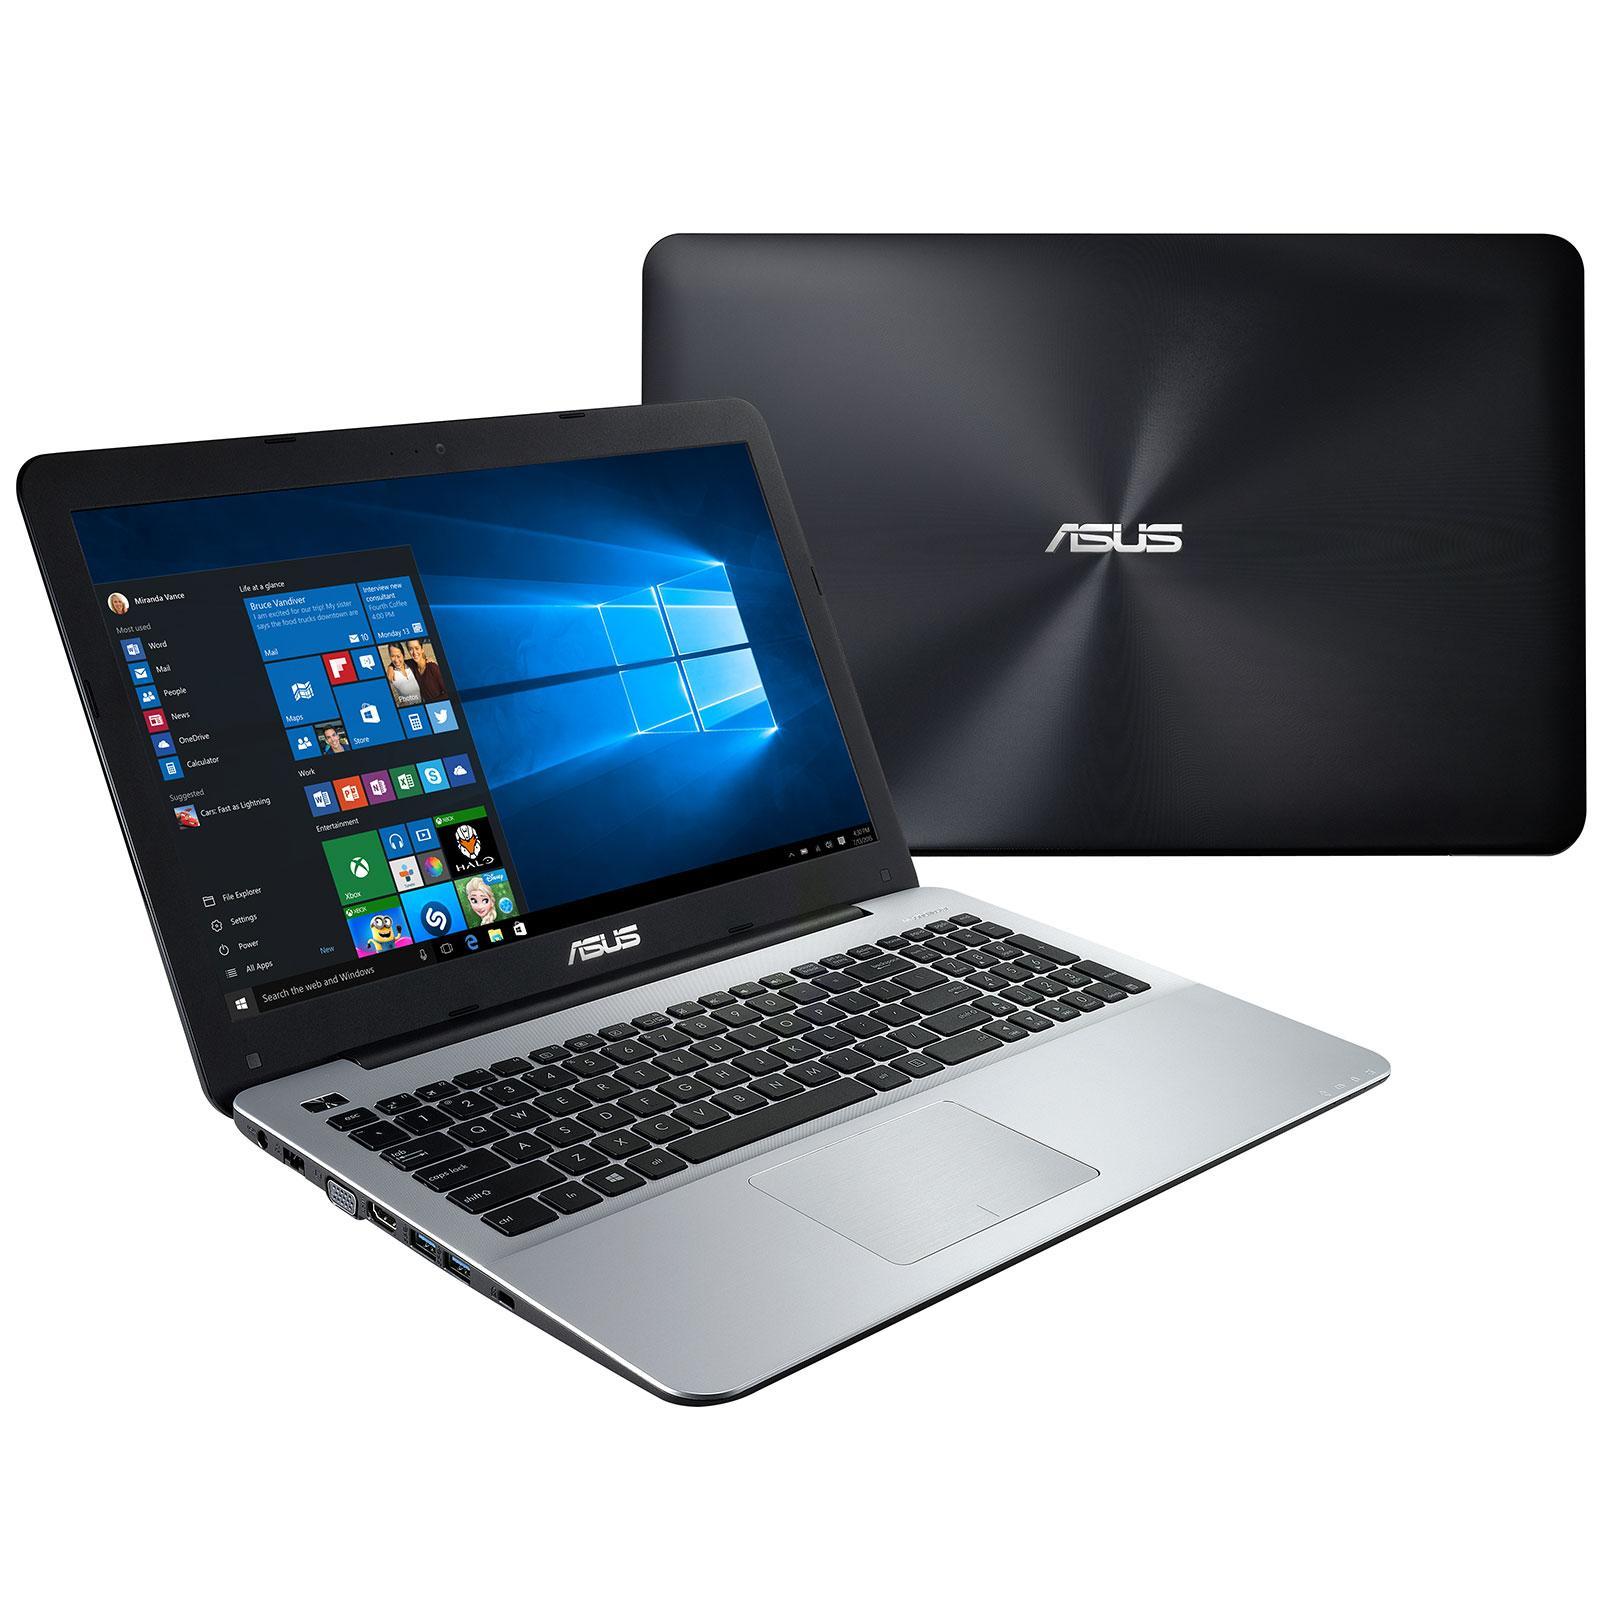 "PC portable 15.6"" Asus R556LJ-DM1313T (i5-5200U, GeForce 920M, 6 Go de RAM, 1 To)"